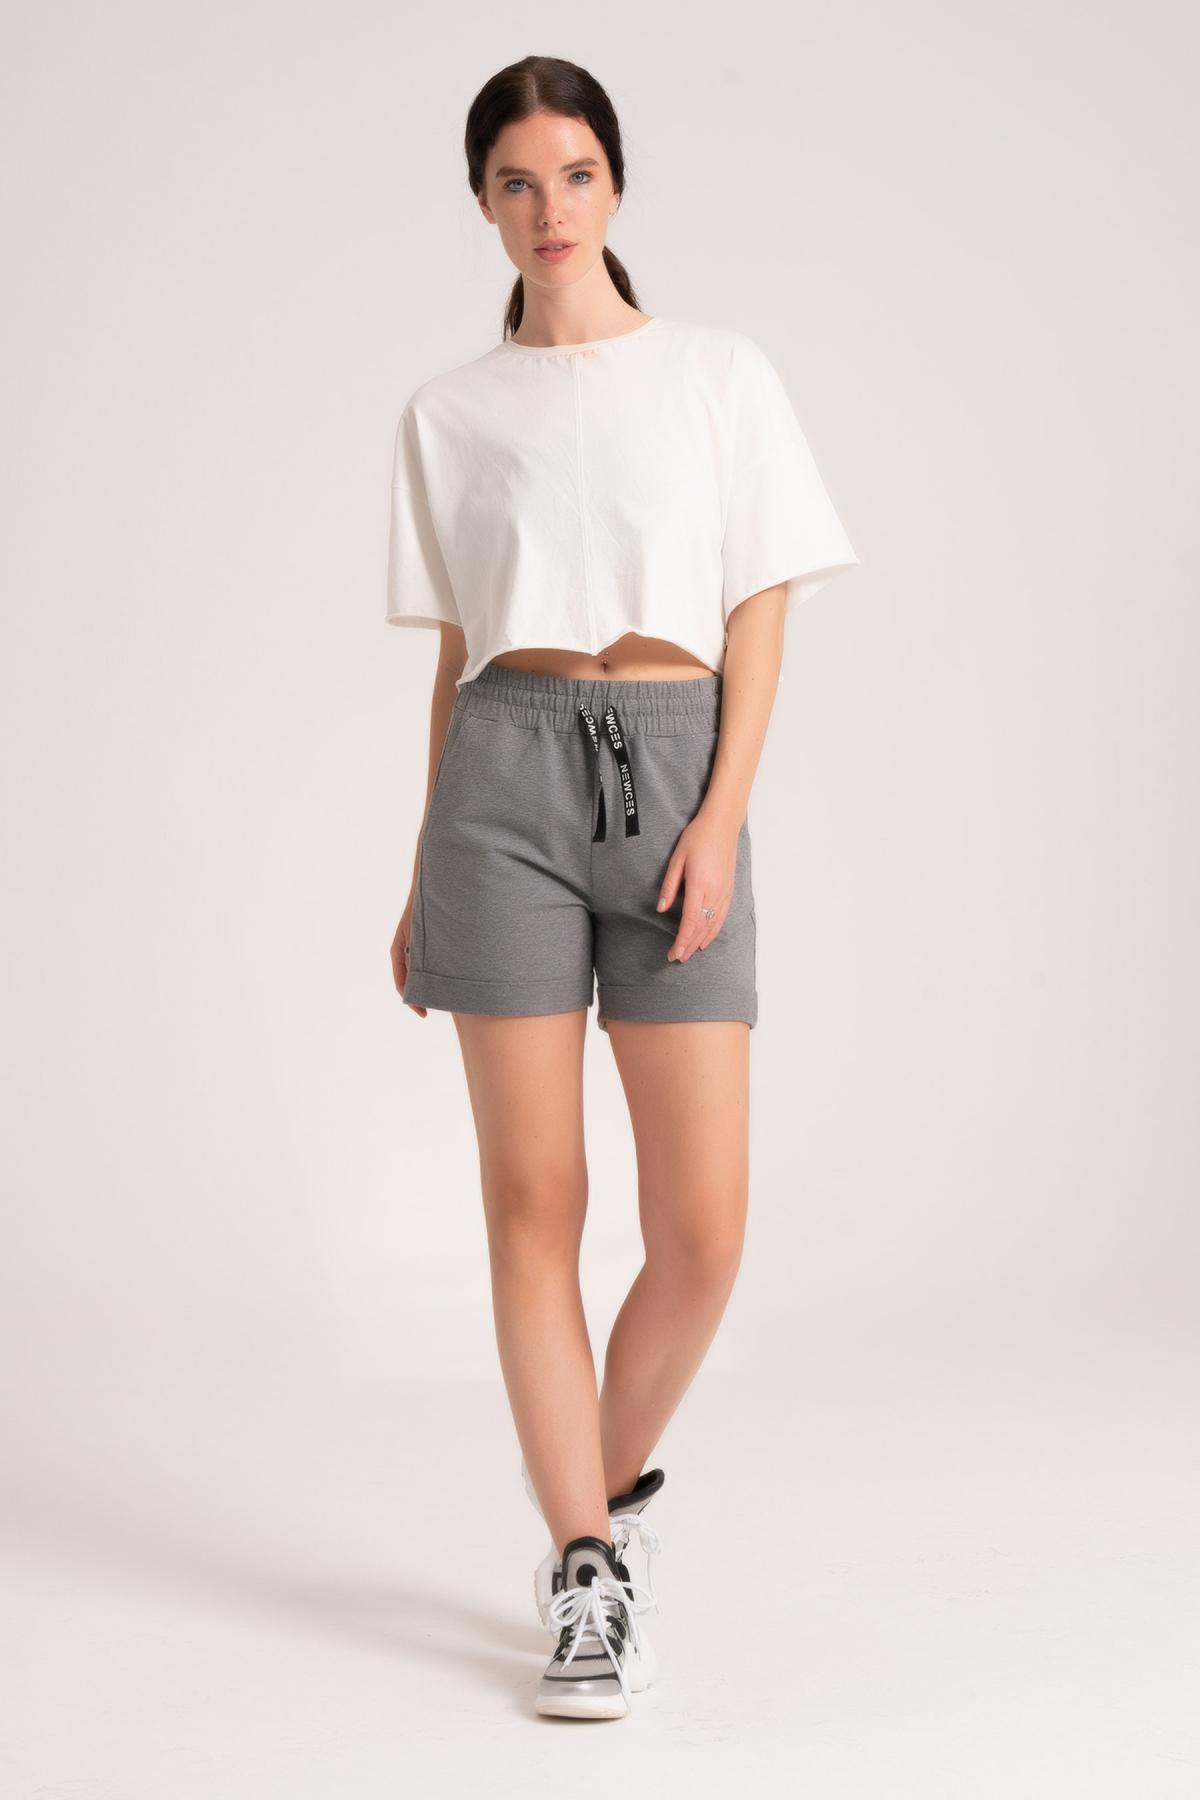 Comfortable Fit Shorts Women newces-1005-AN